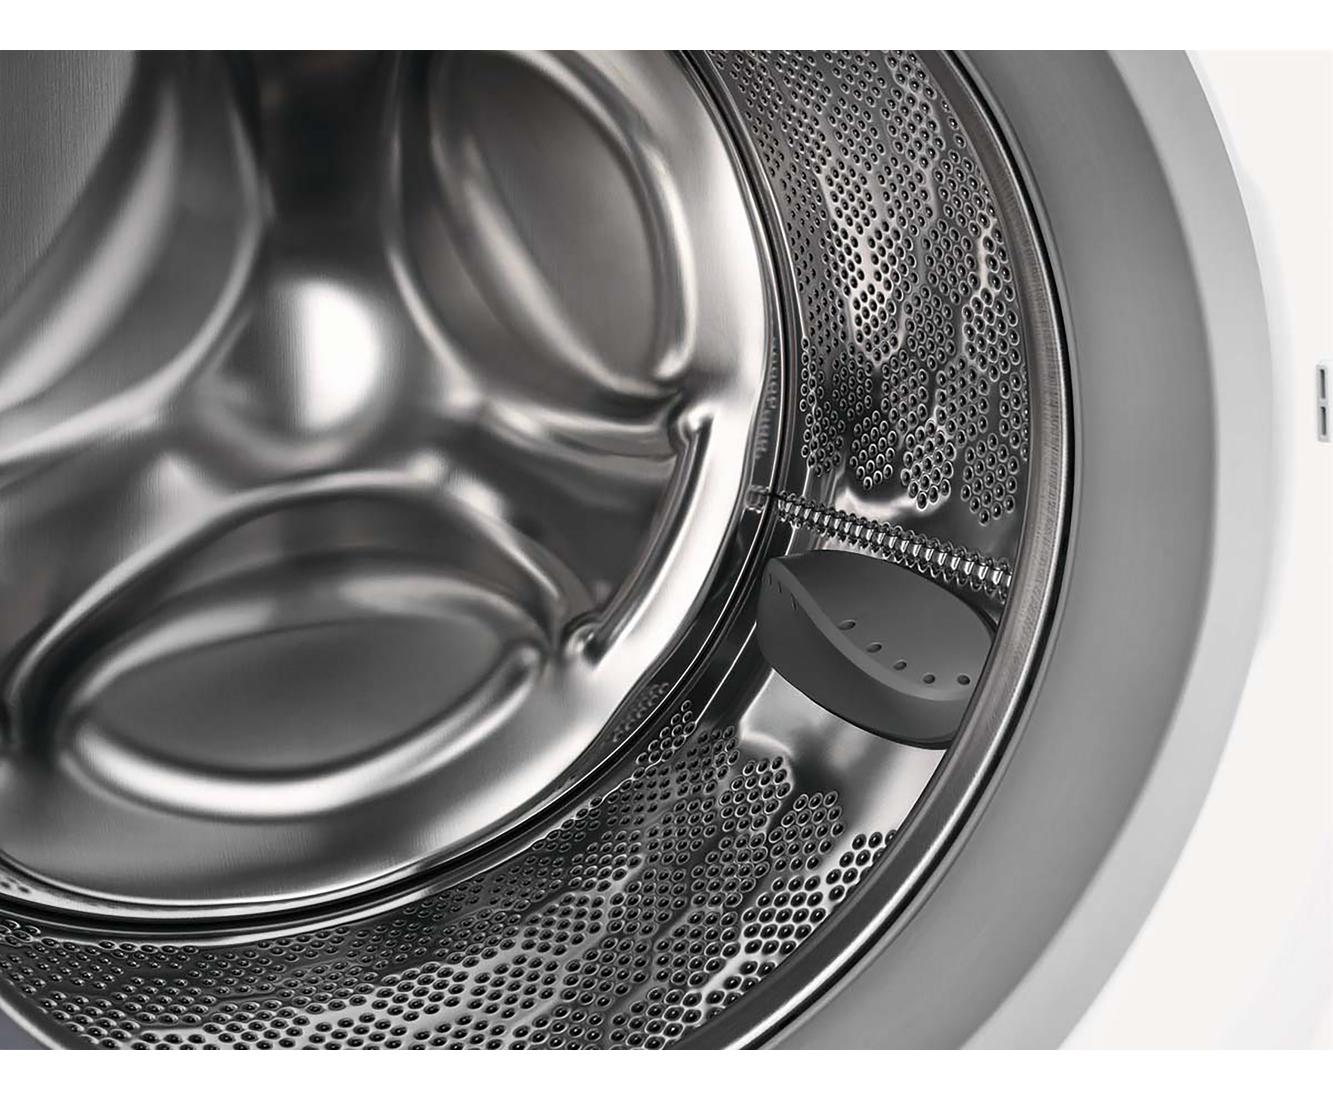 aeg l6fba68 waschmaschine lavamat freistehend wei 223 neu ebay